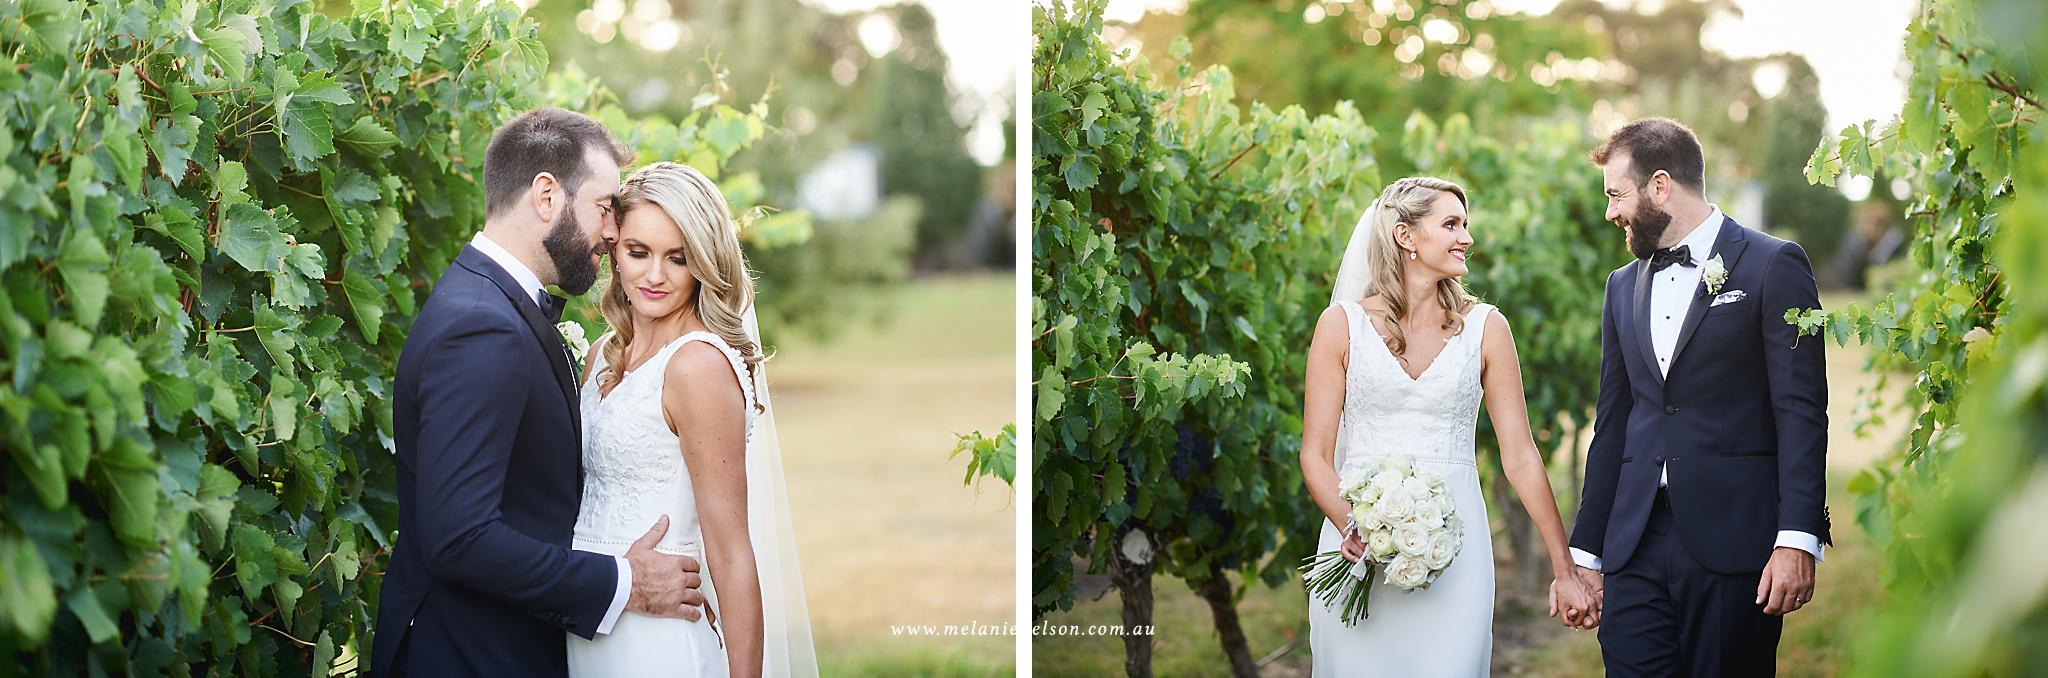 longview_vineyard_wedding_0068.jpg